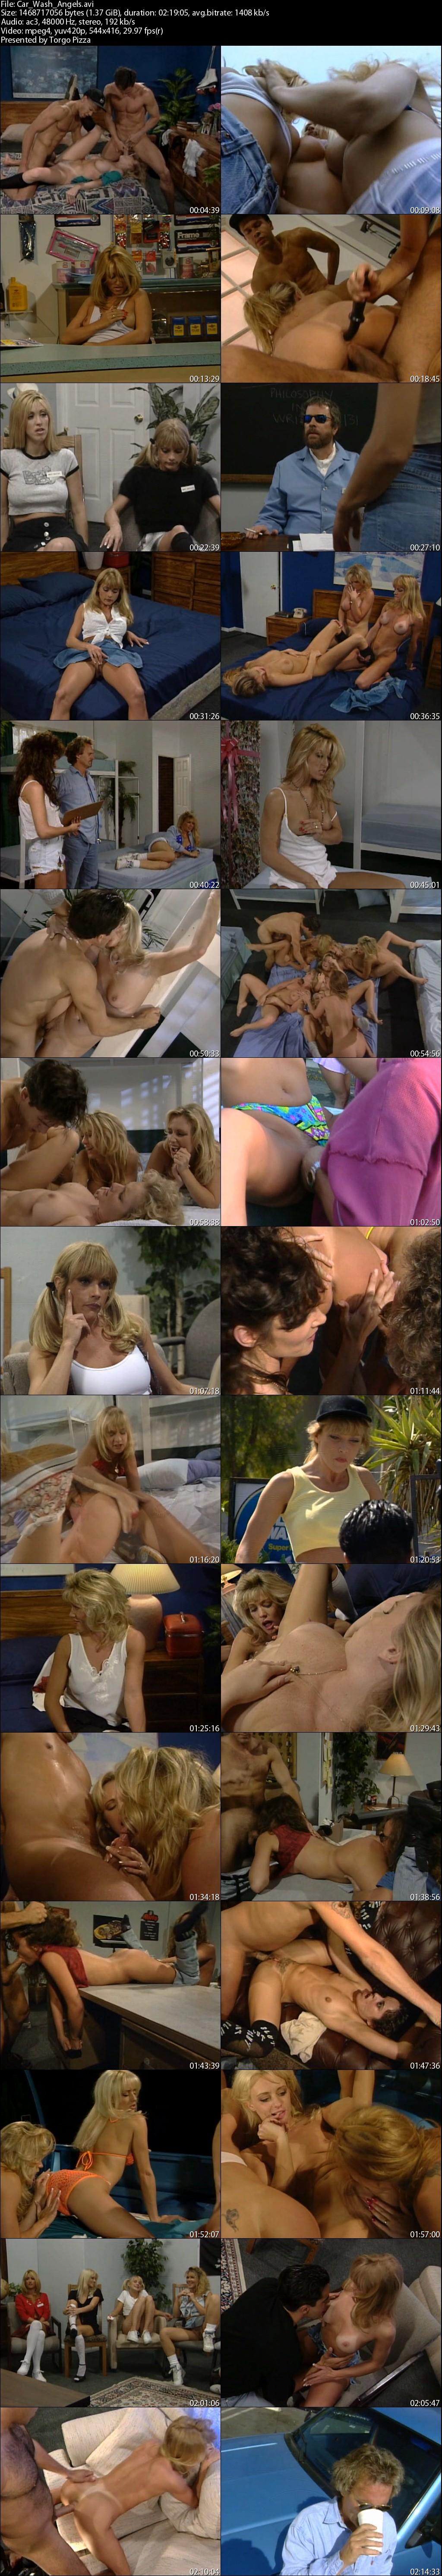 Andrea Grosso Molnar Porno i love the 90s! porn movies & starlets! (single links